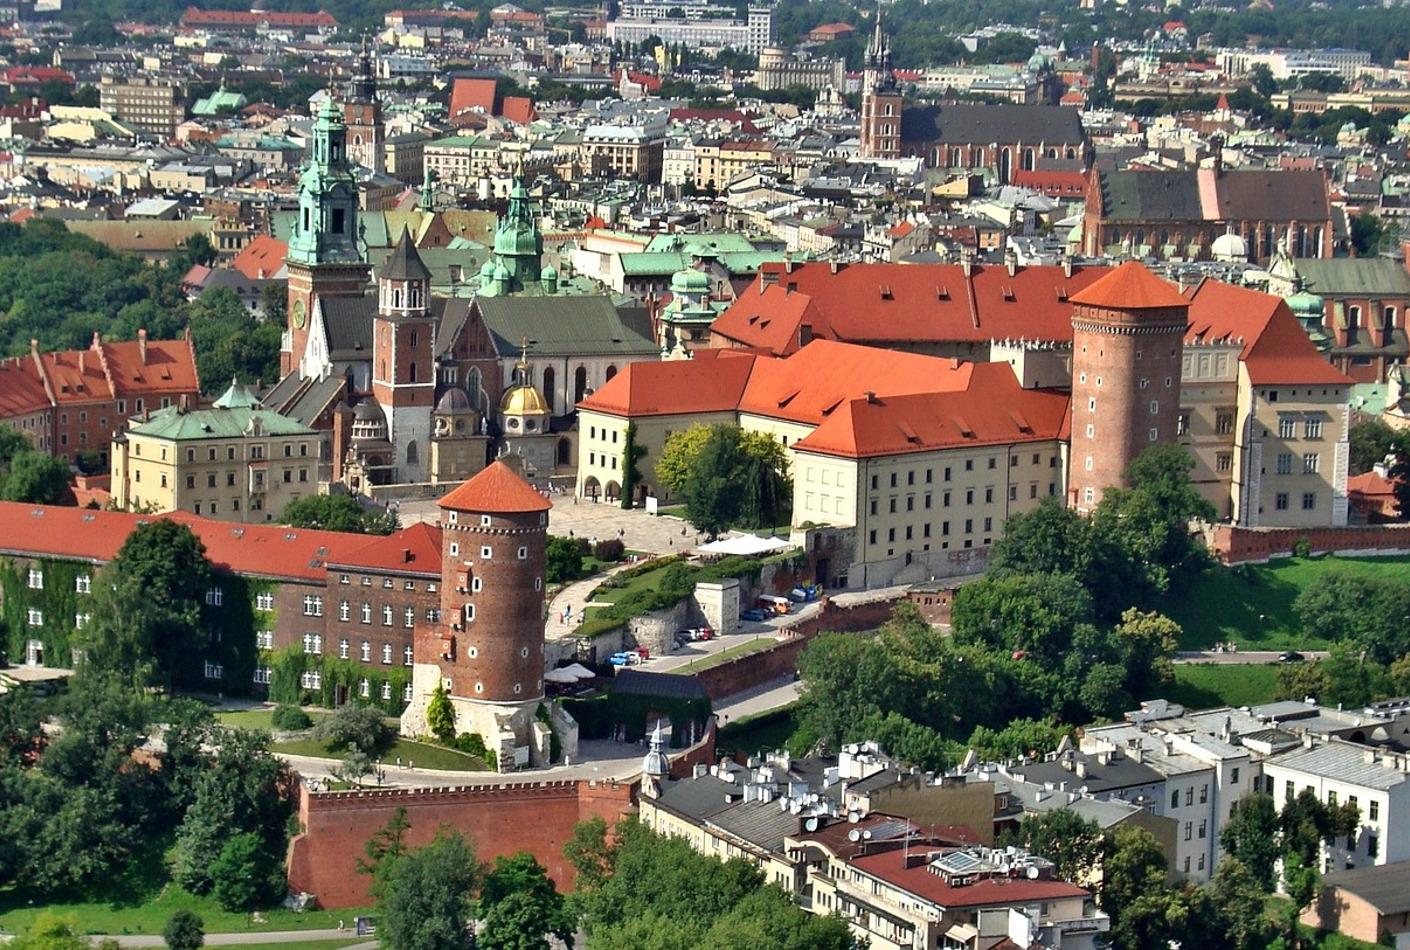 Vista aérea de Cracovia